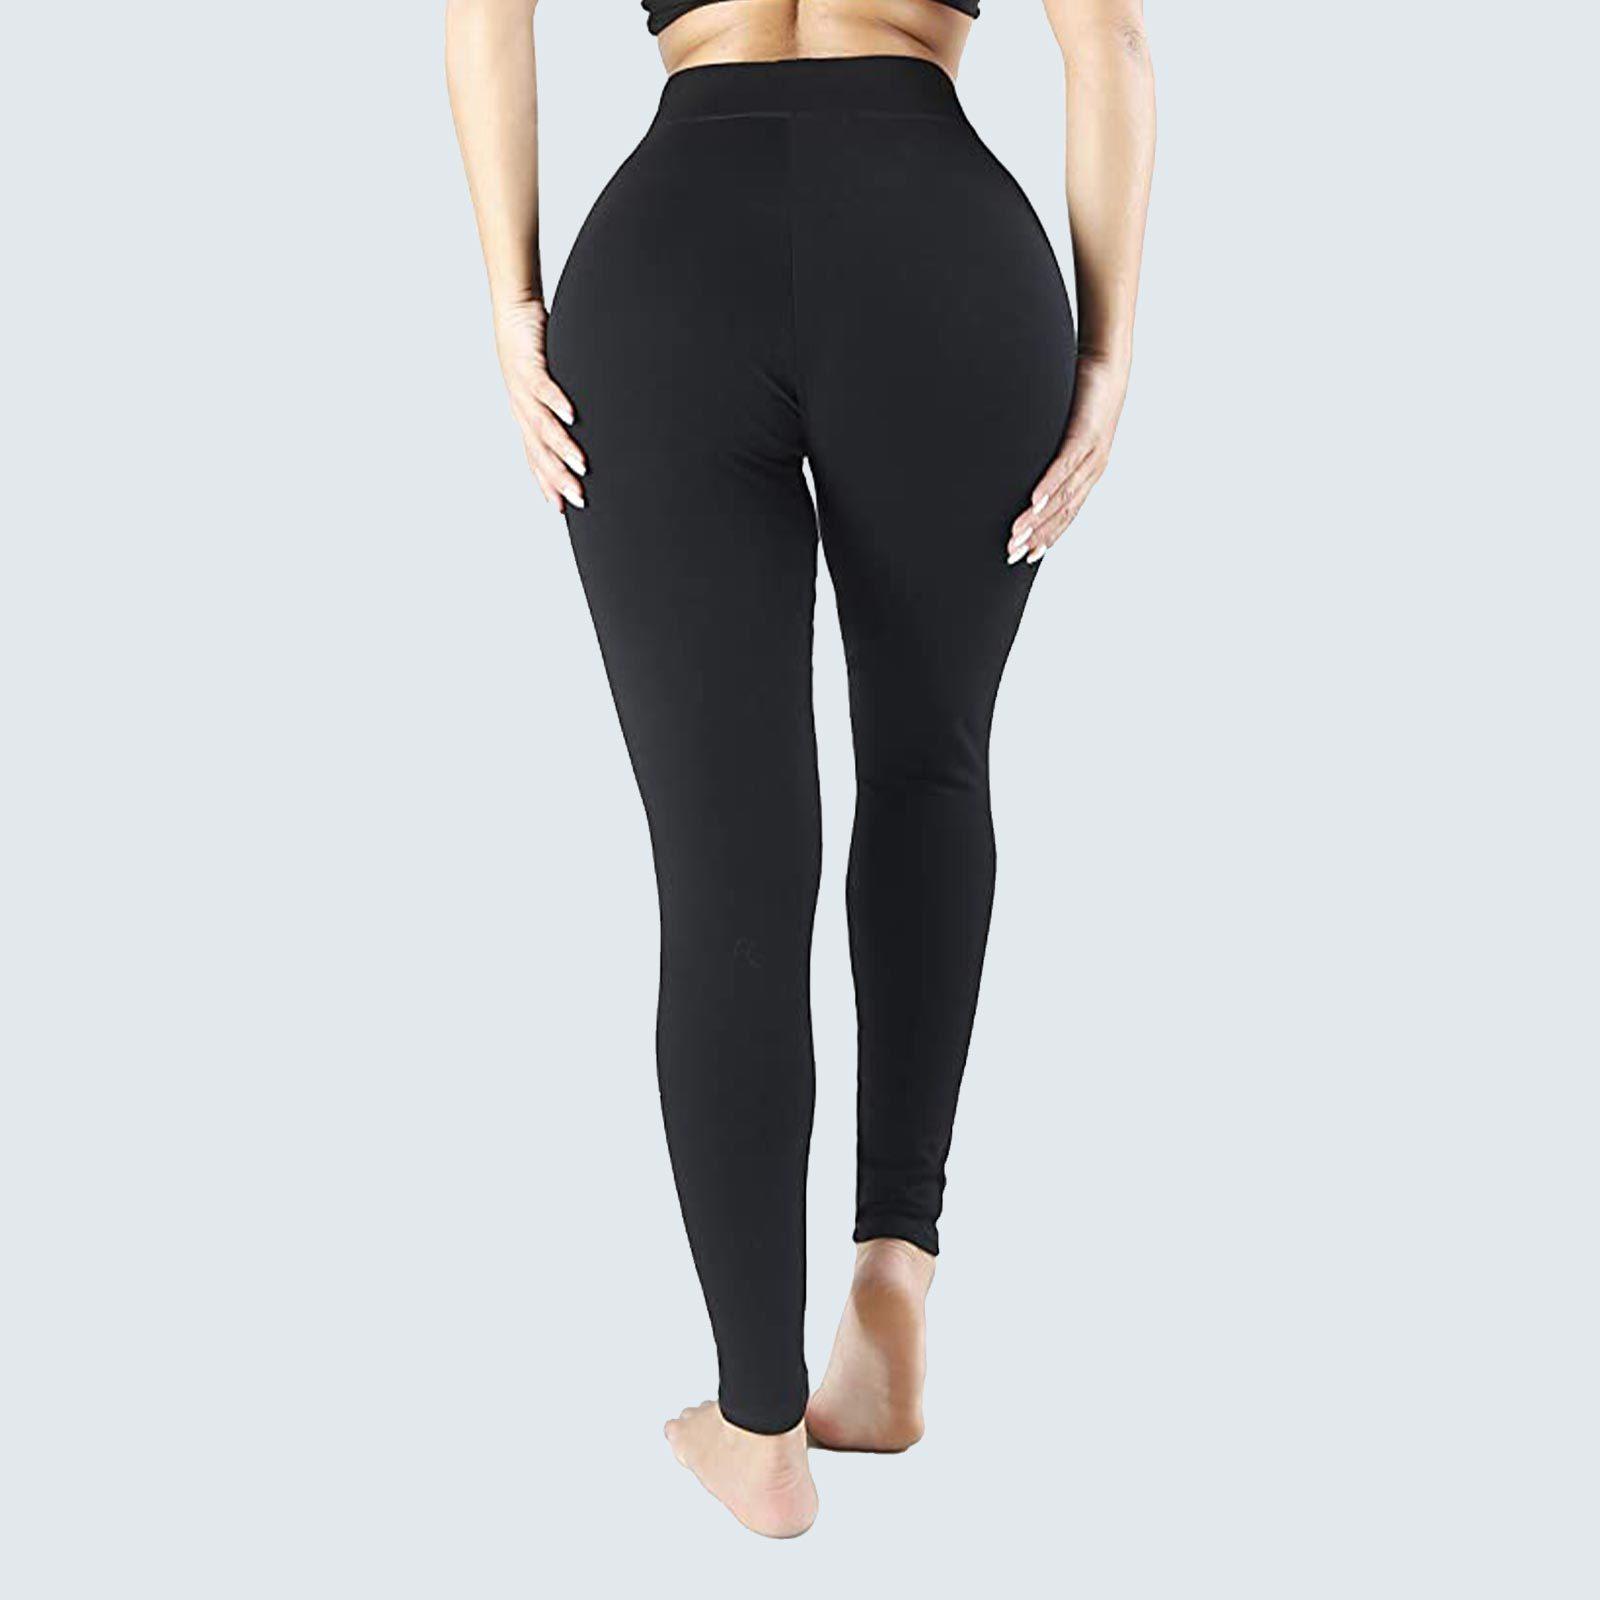 Best plus-size leggings: SeaWhisper Leggings